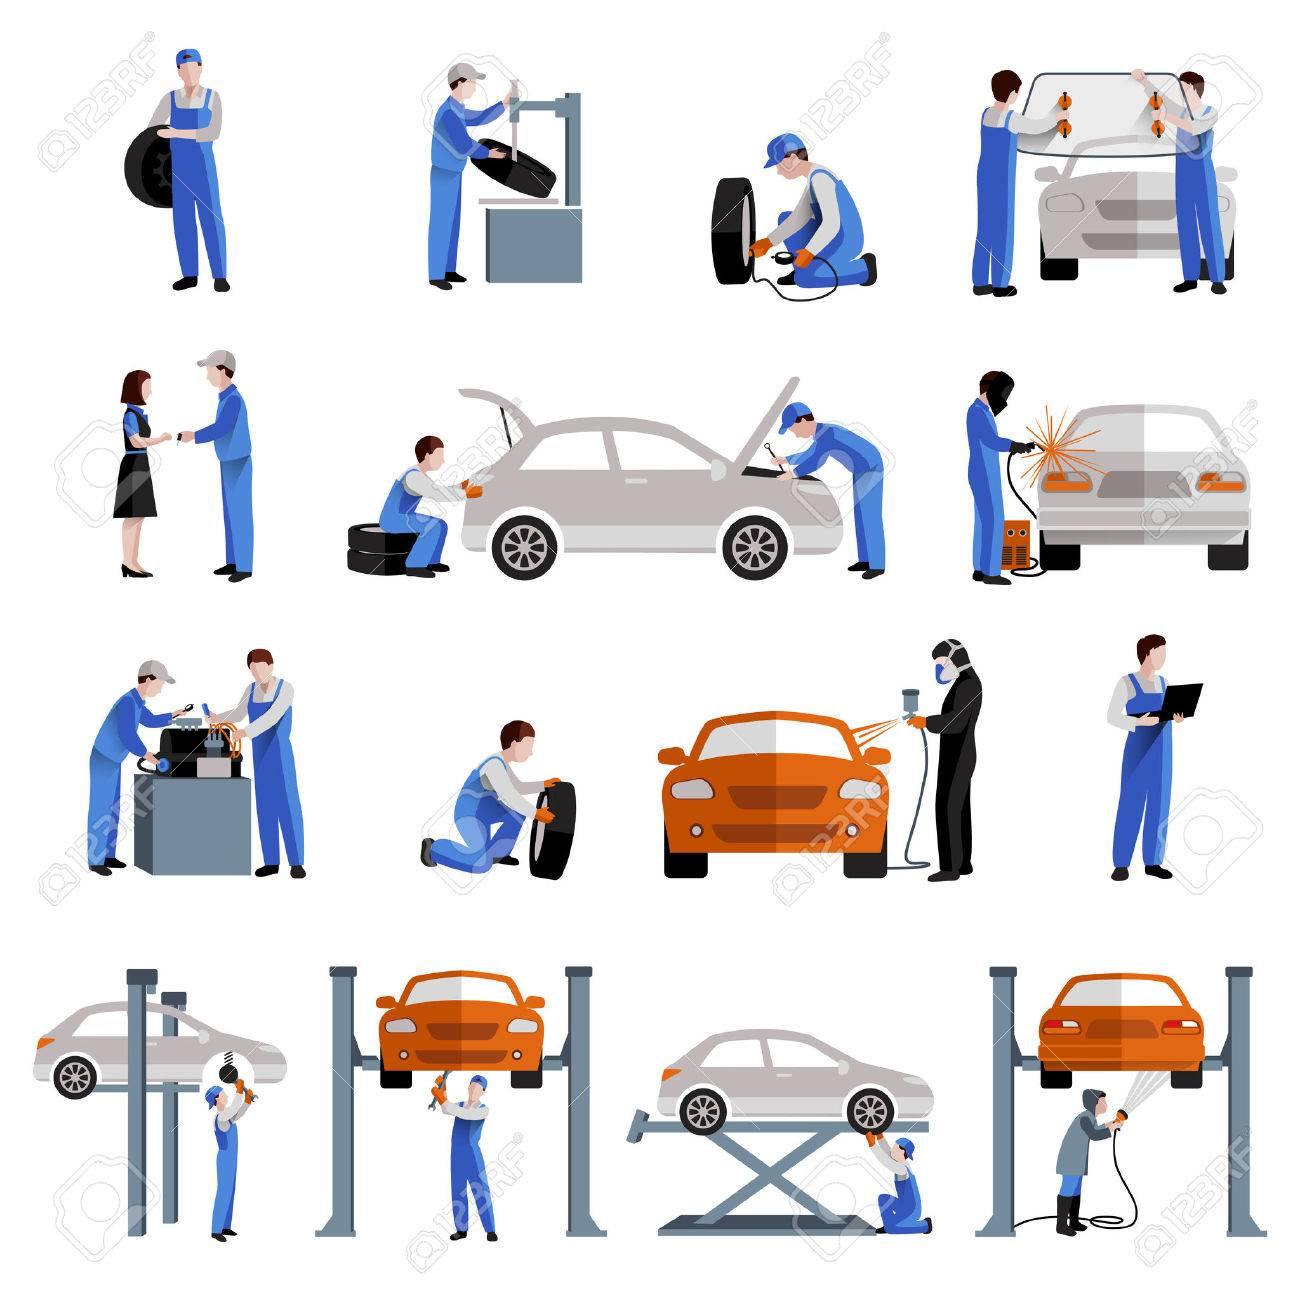 Auto mechanic car service repair and maintenance work icons set